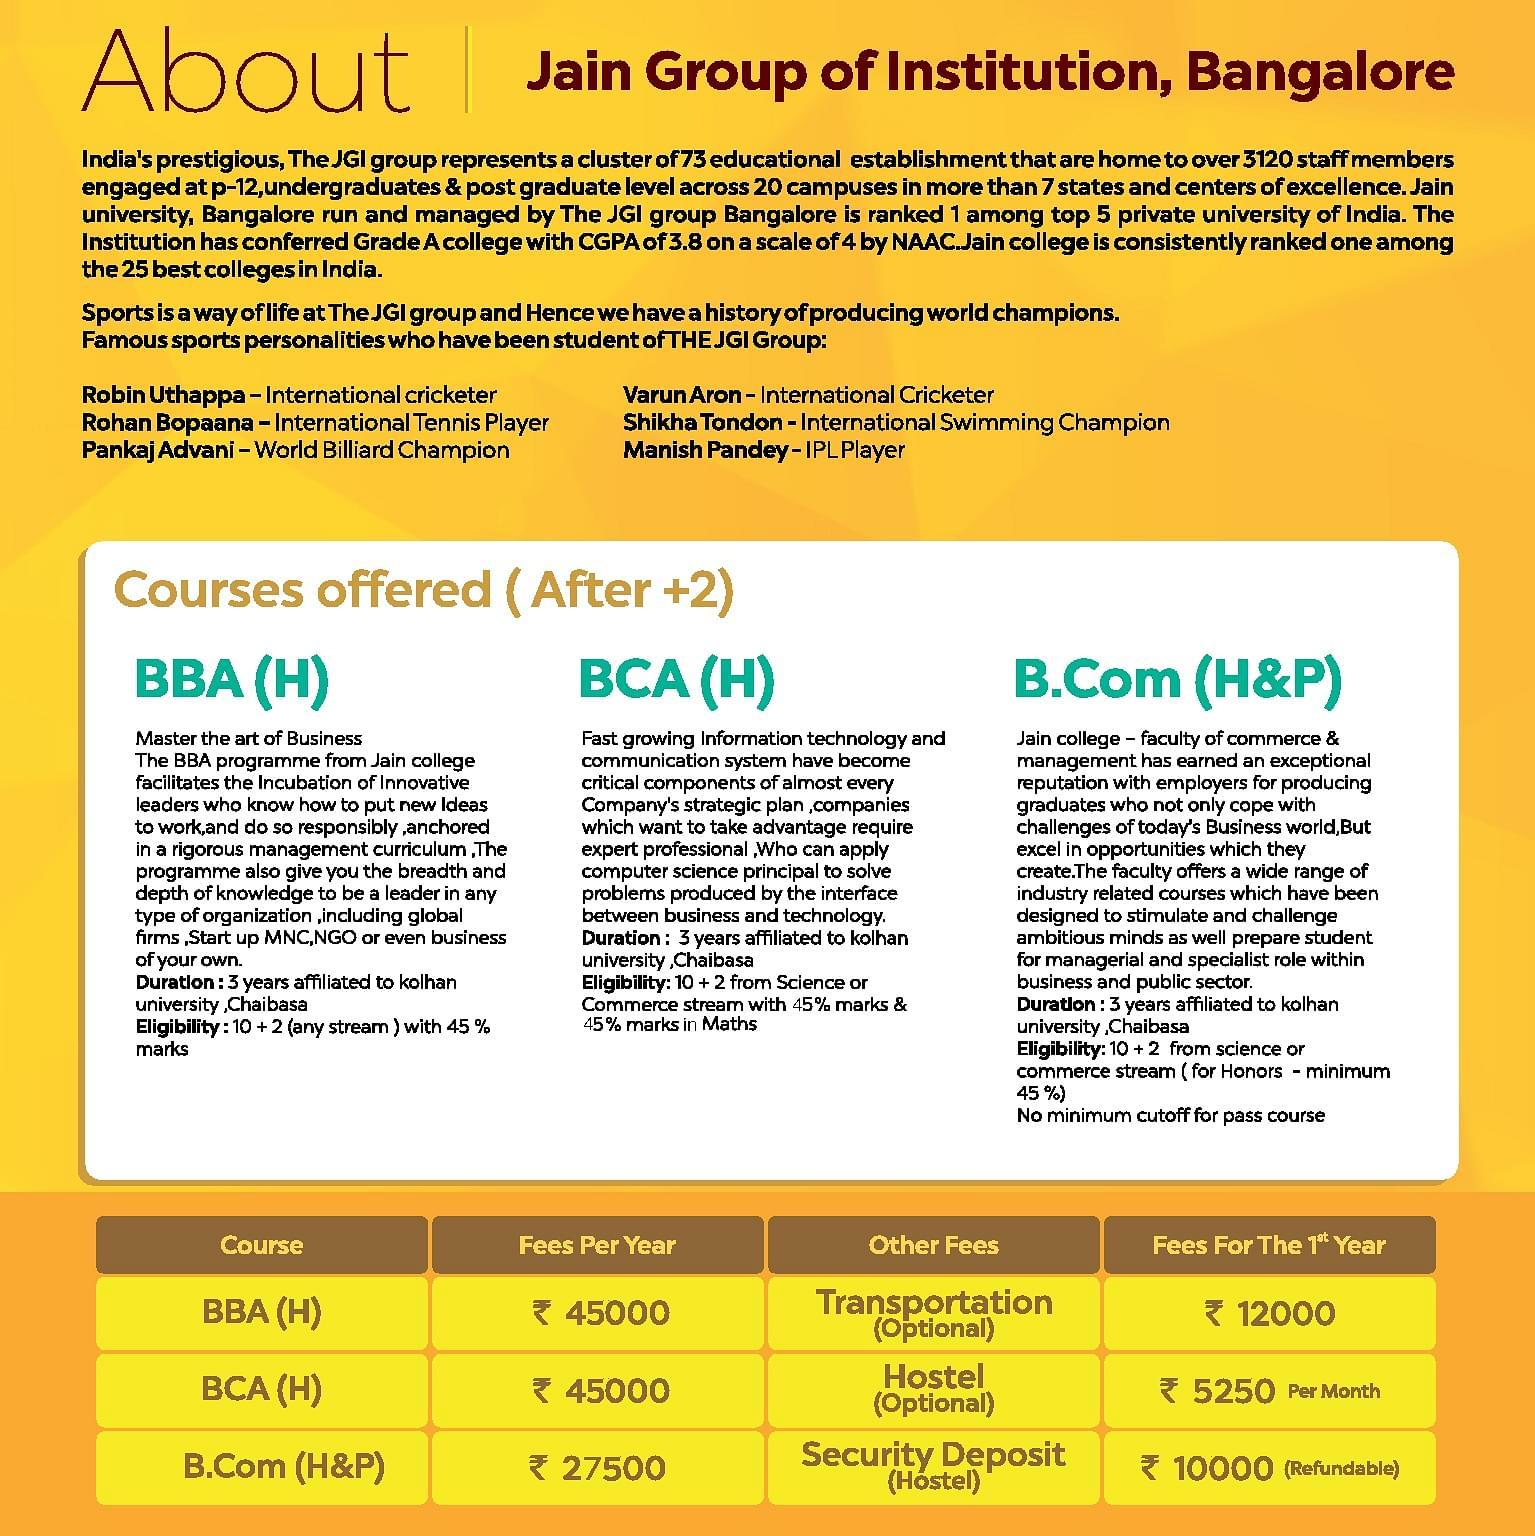 full-1 Jain University Application Form on nigeria govt diploma online, jee exam, us lottery, new school, junior engineer job, for miss glamorous, for namwater, for p1 teachers, divine word university, naba scholarship, flomaton police,